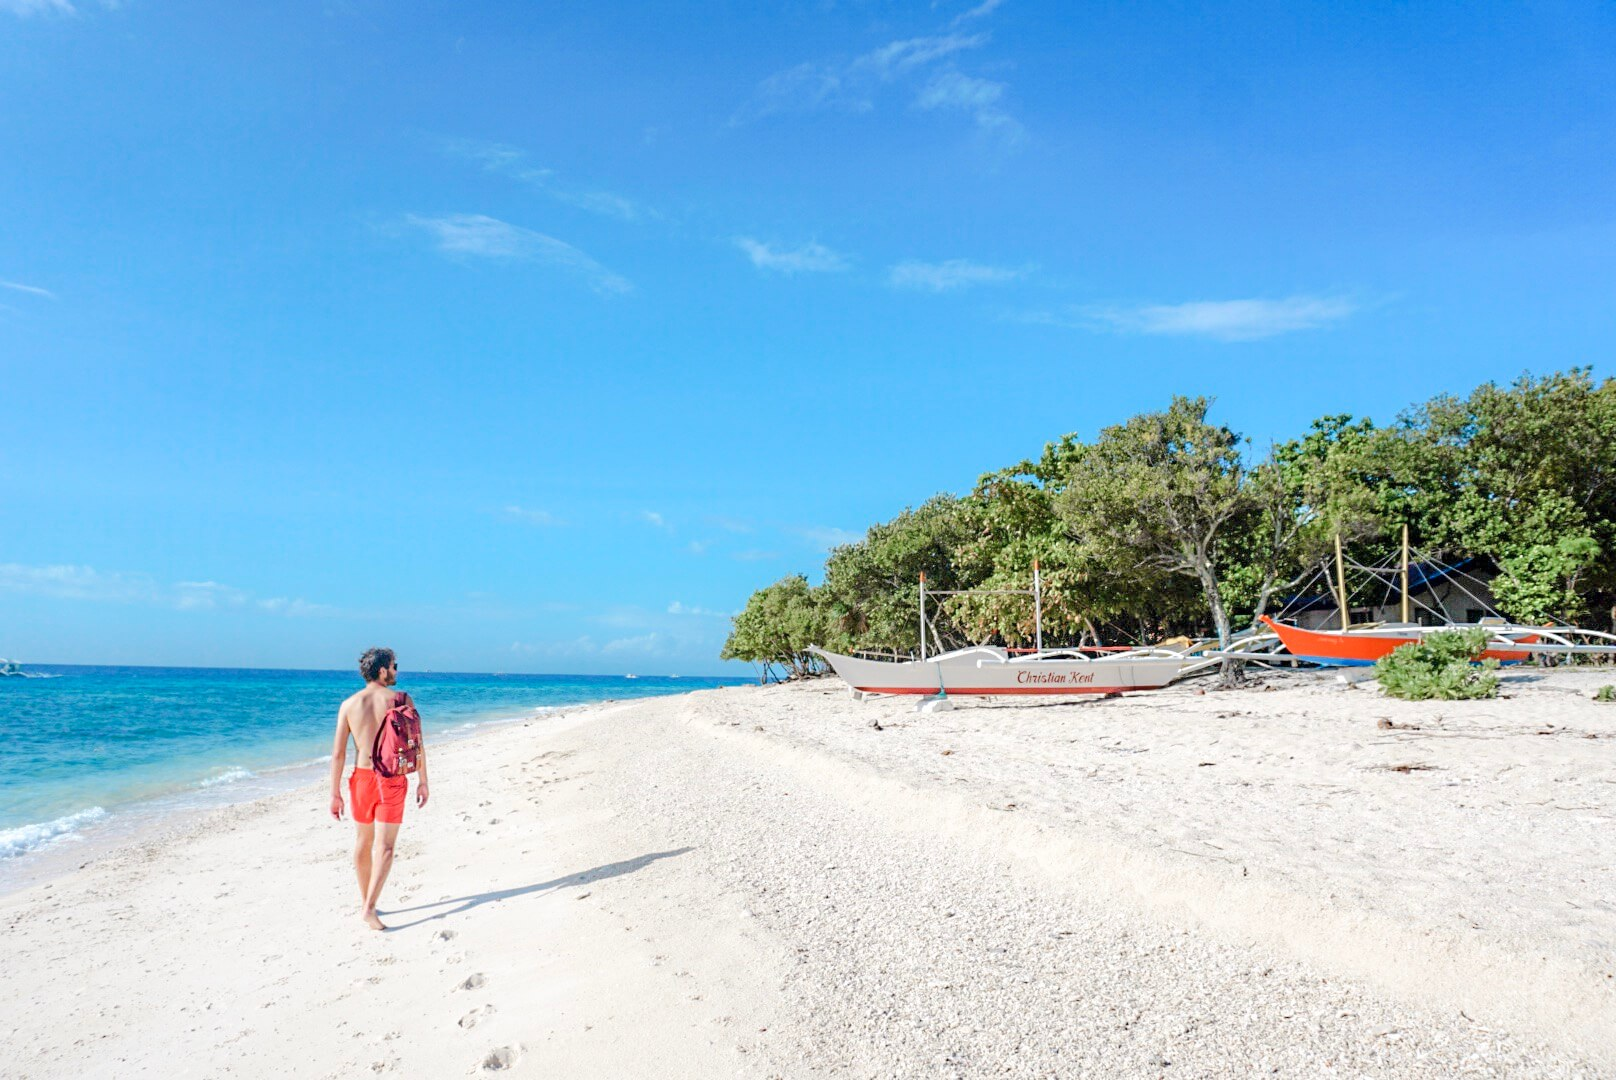 Island Hopping plage de Balicasag Panglao Bohol Philippines